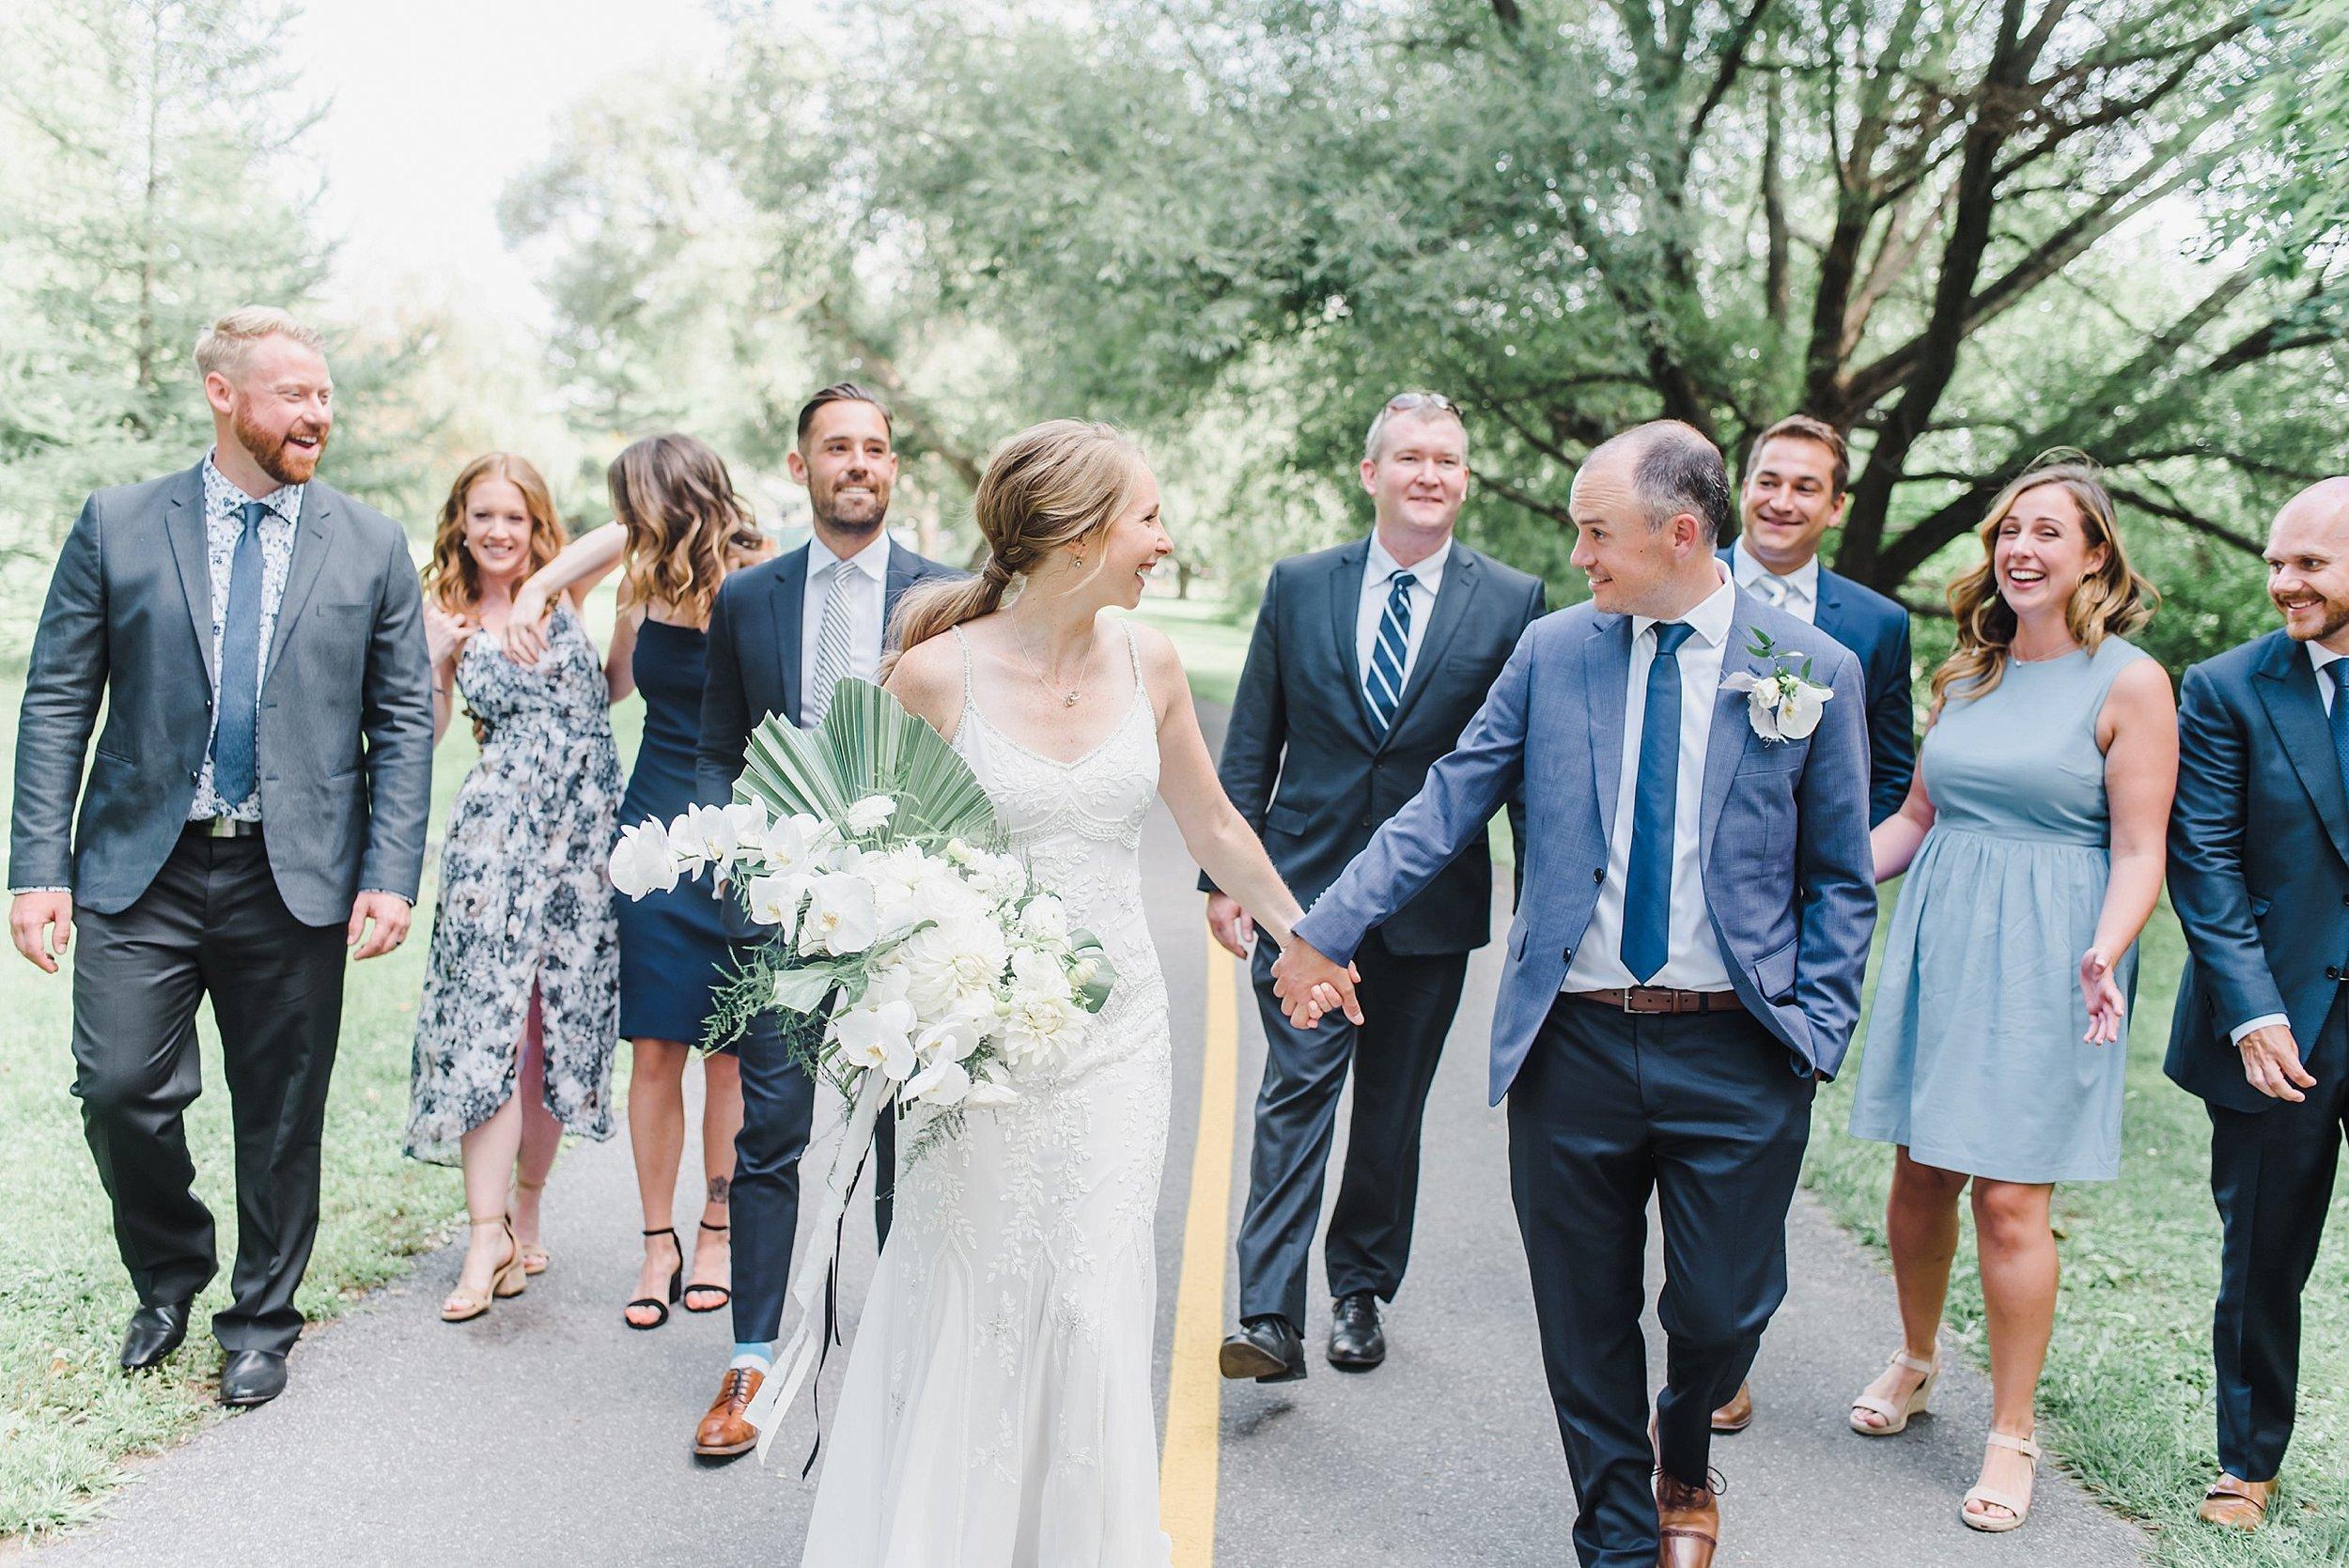 light airy indie fine art ottawa wedding photographer | Ali and Batoul Photography_0667.jpg